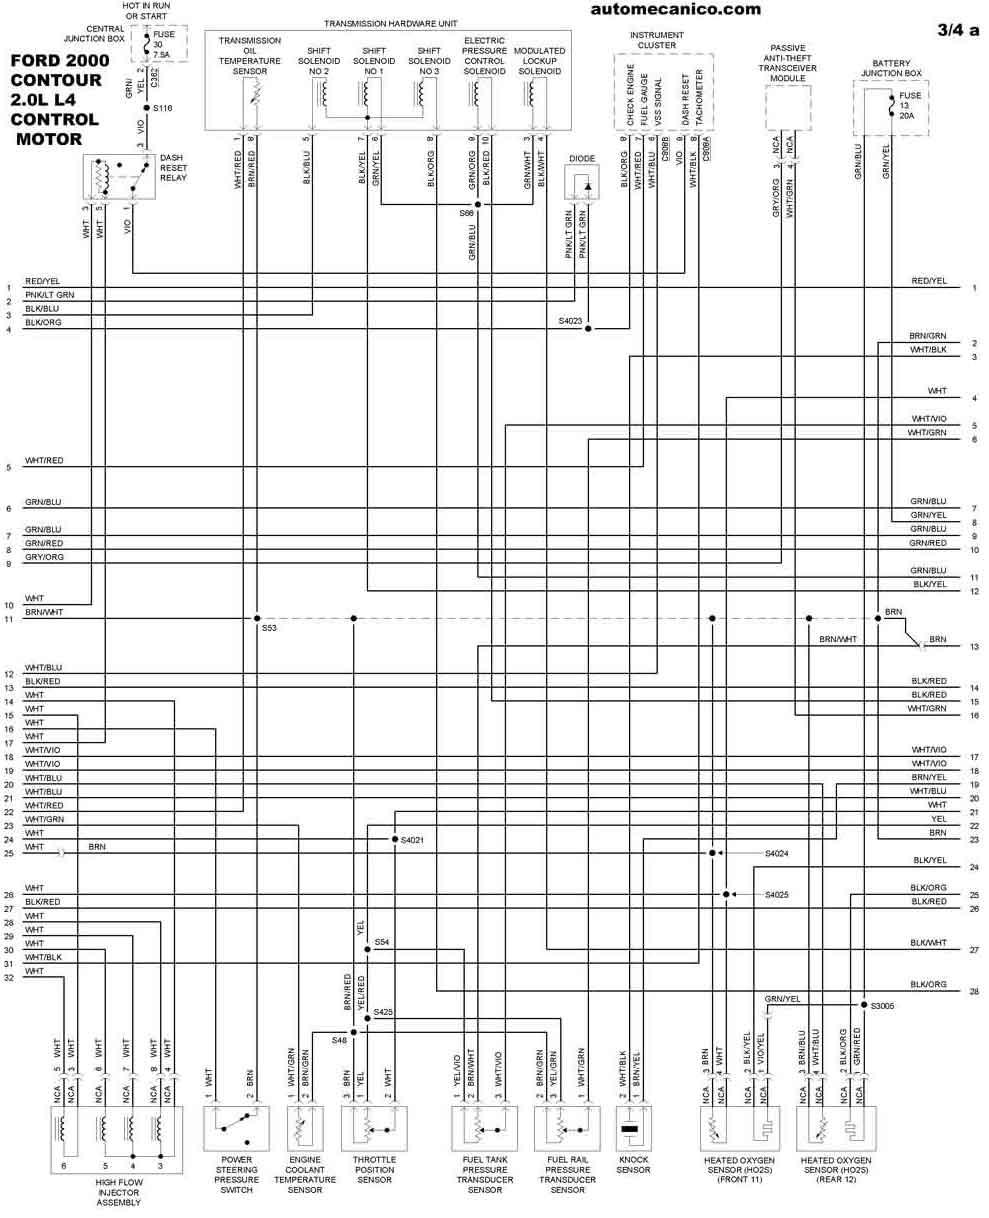 ford 2000 - diagramas control del motor - graphics - esquemas